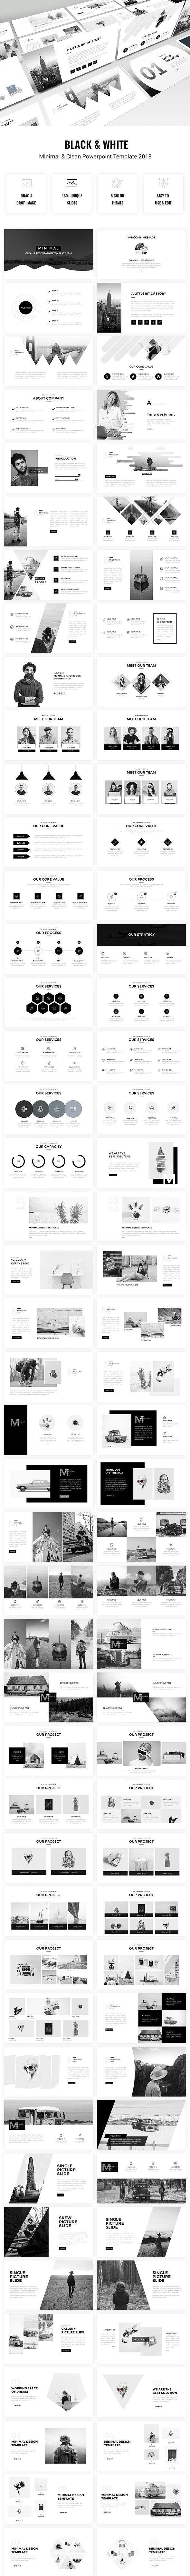 Minimal - Black & White Powerpoint Template 2018 - Creative PowerPoint Templates